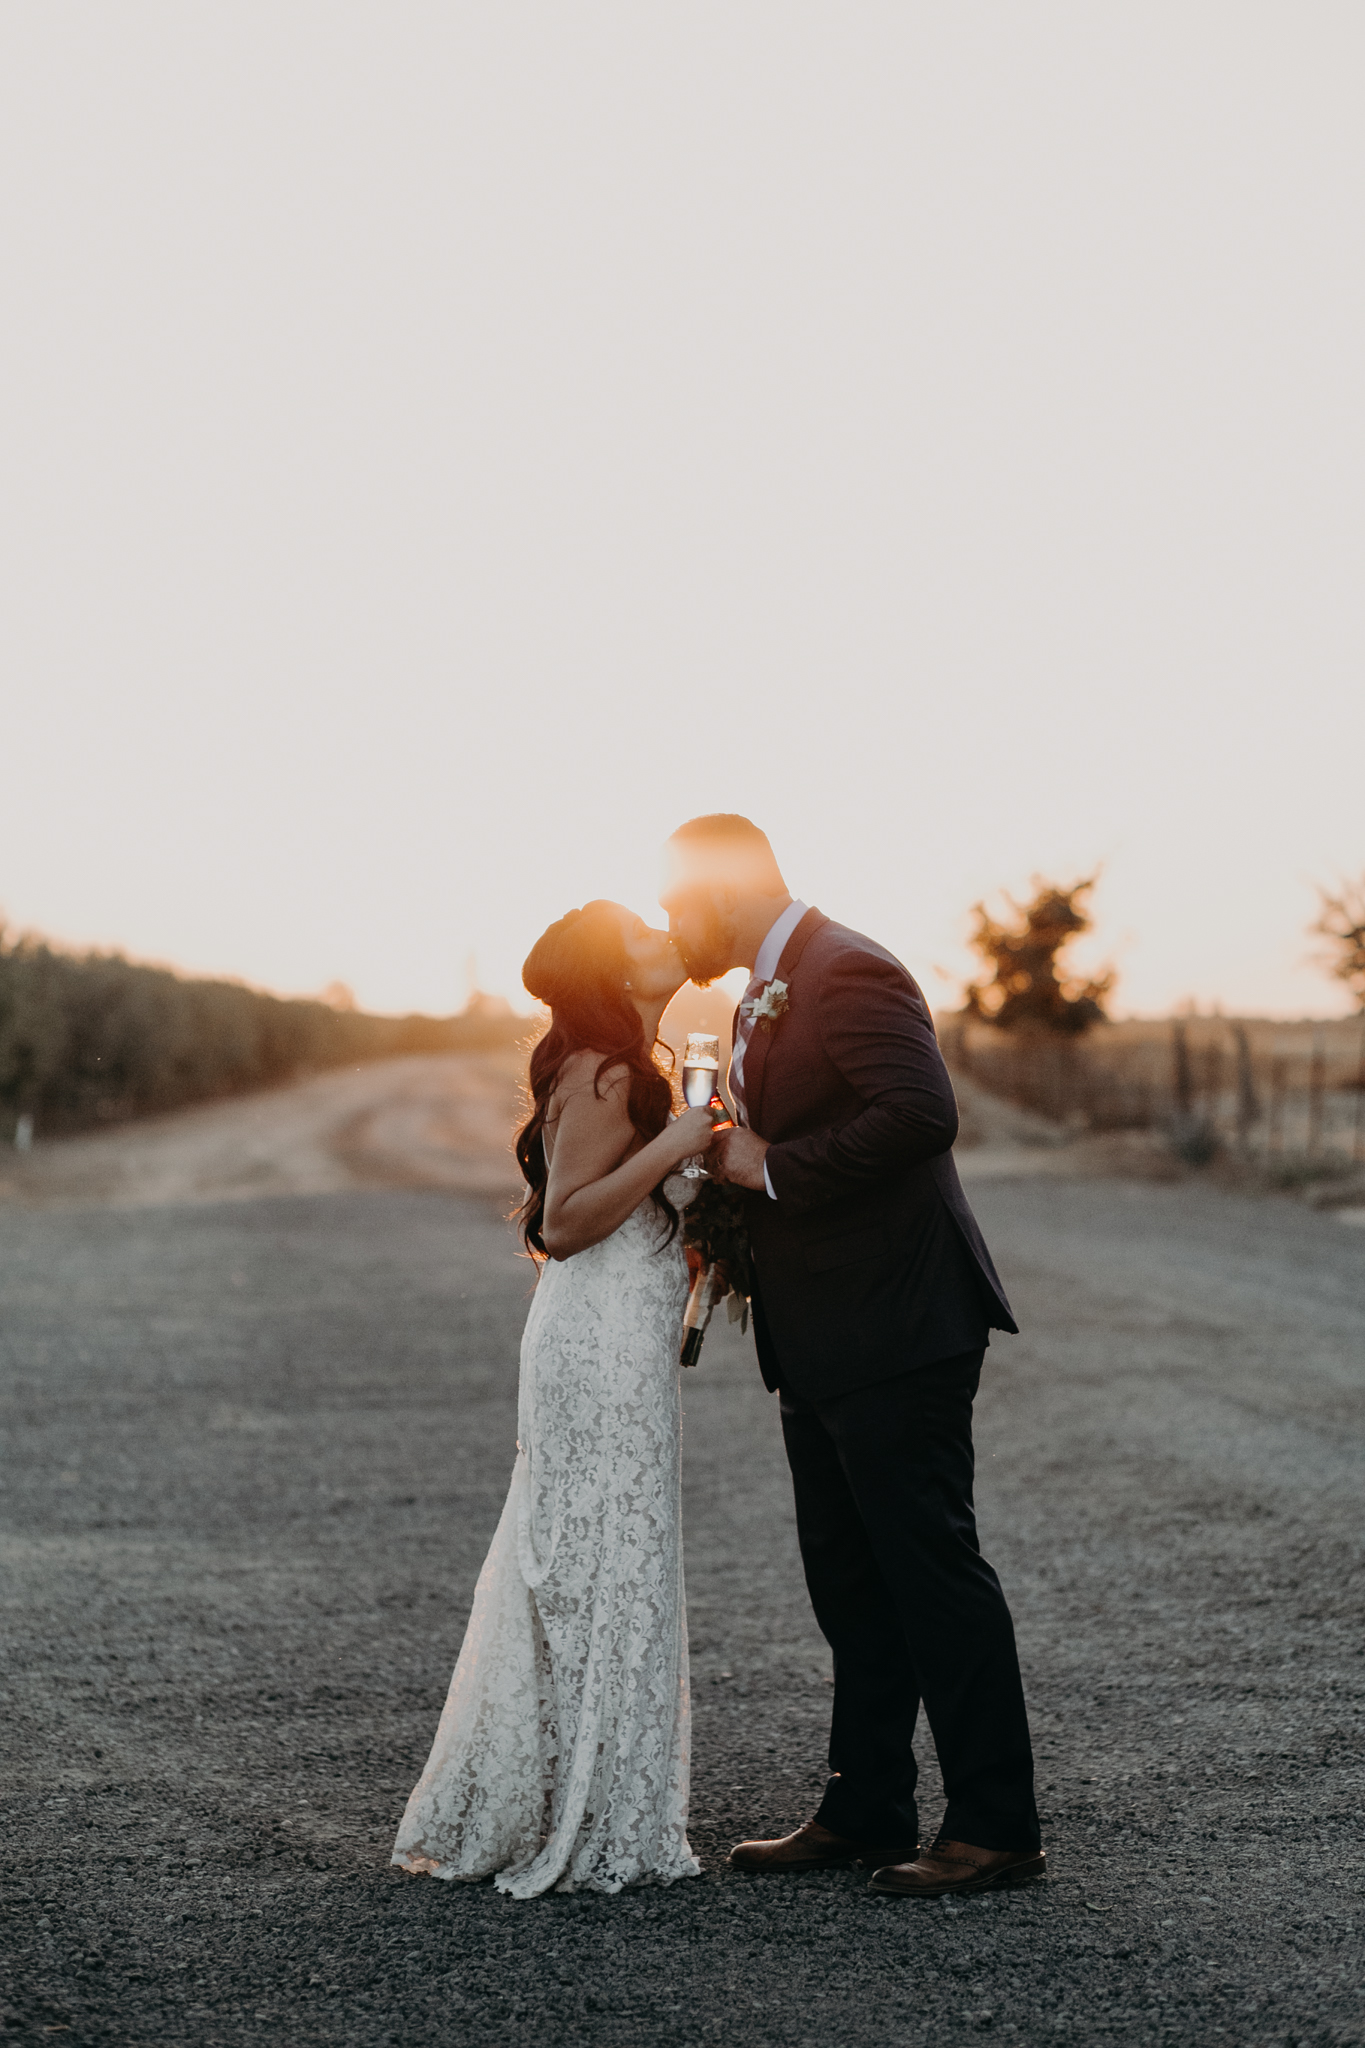 Intimate Rustic Wedding in Escalon, CA by Krystal Stockton